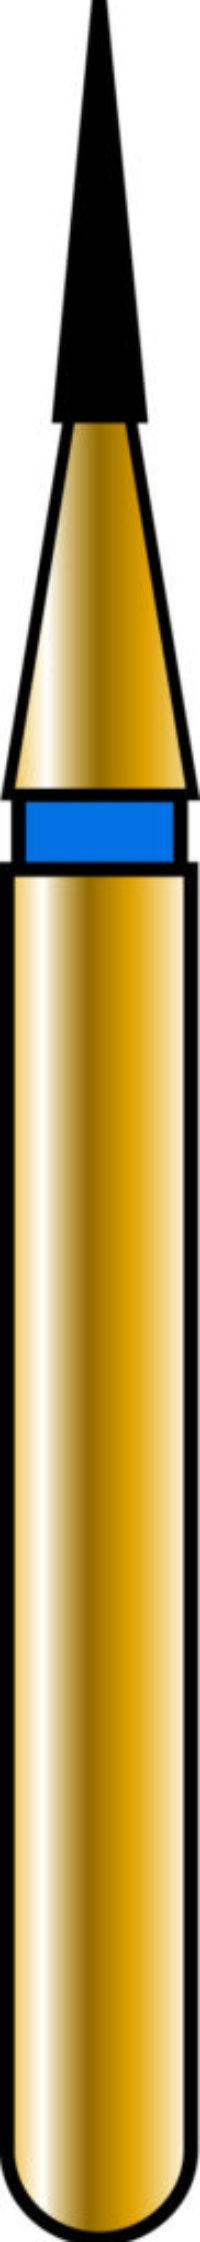 Flame 08-3.5mm Gold Diamond Bur